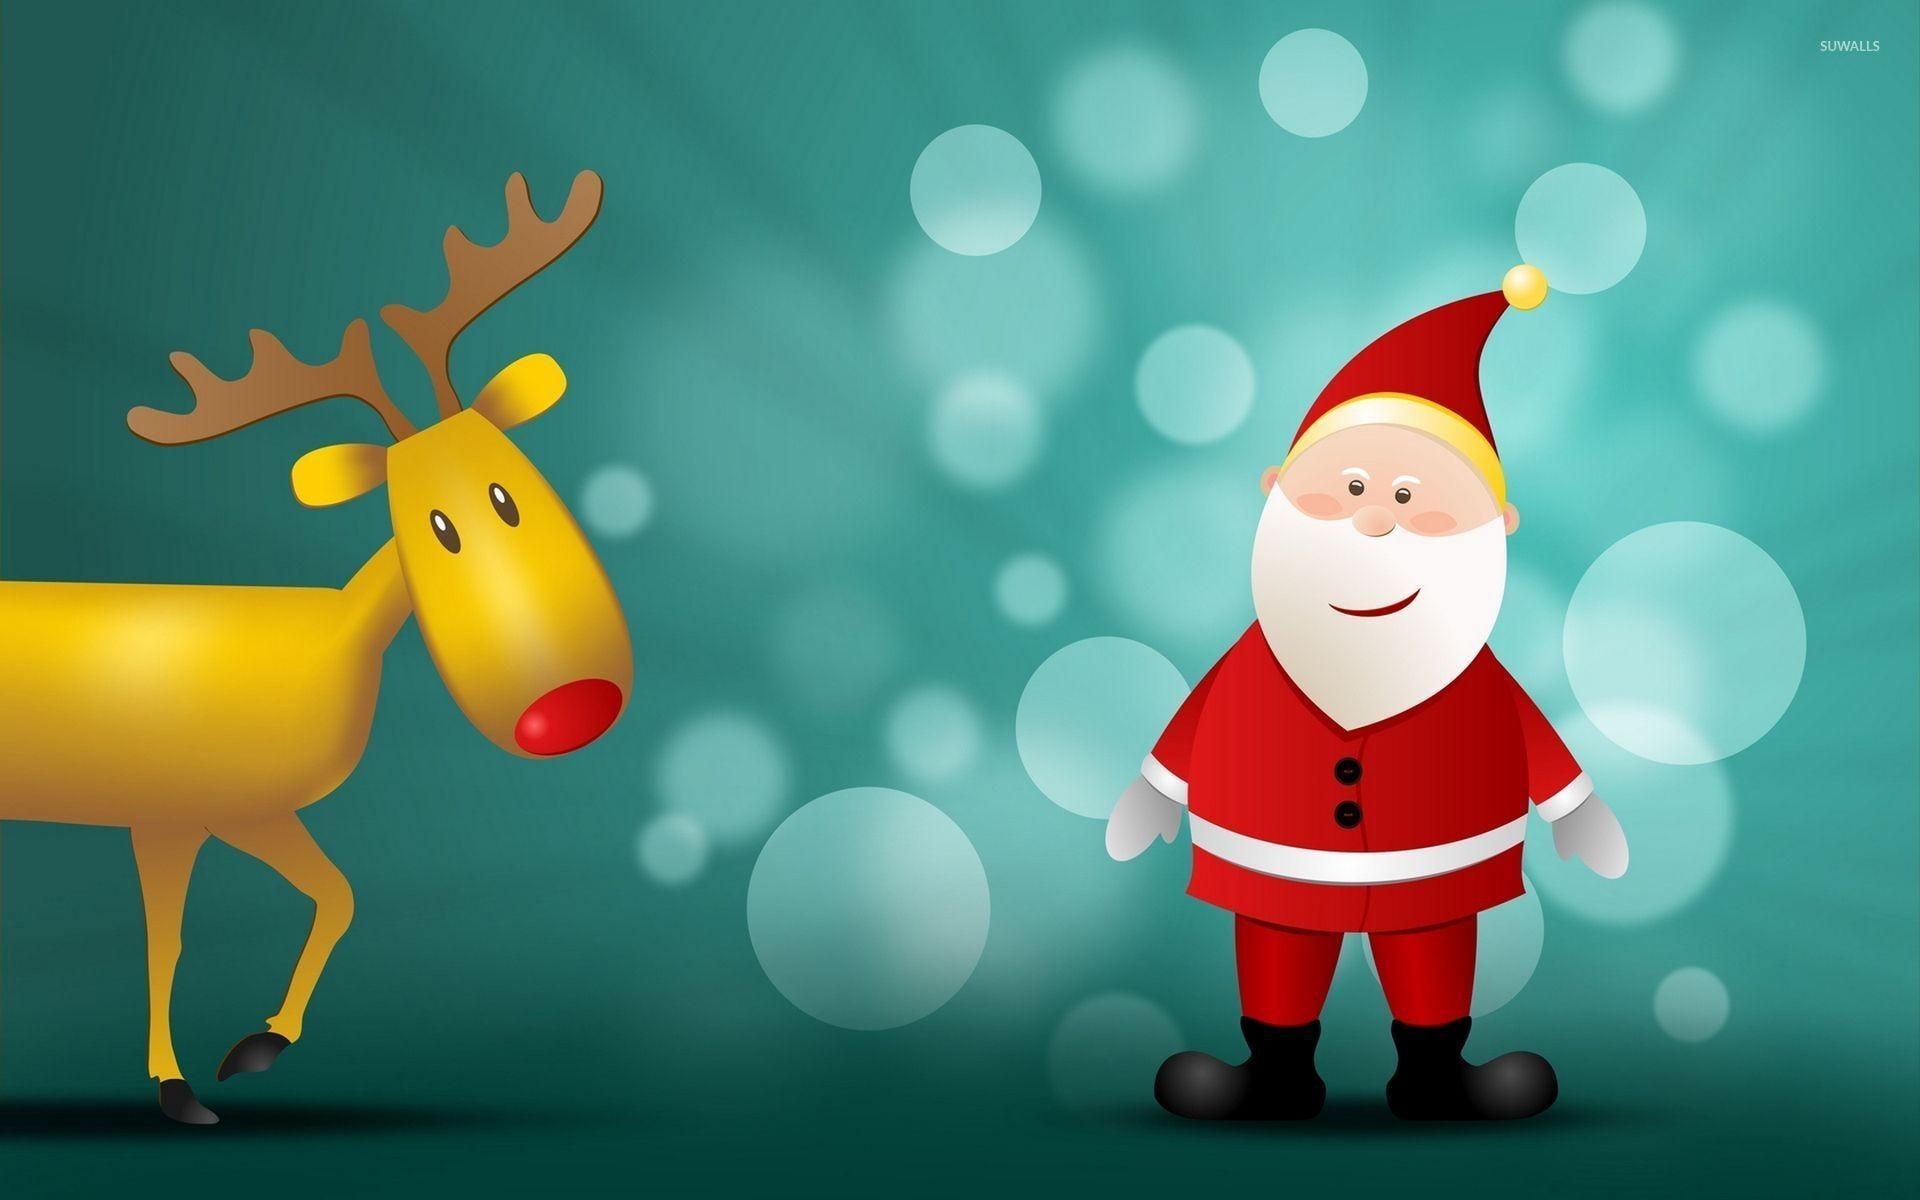 Rudolf and happy Santa Claus wallpaper